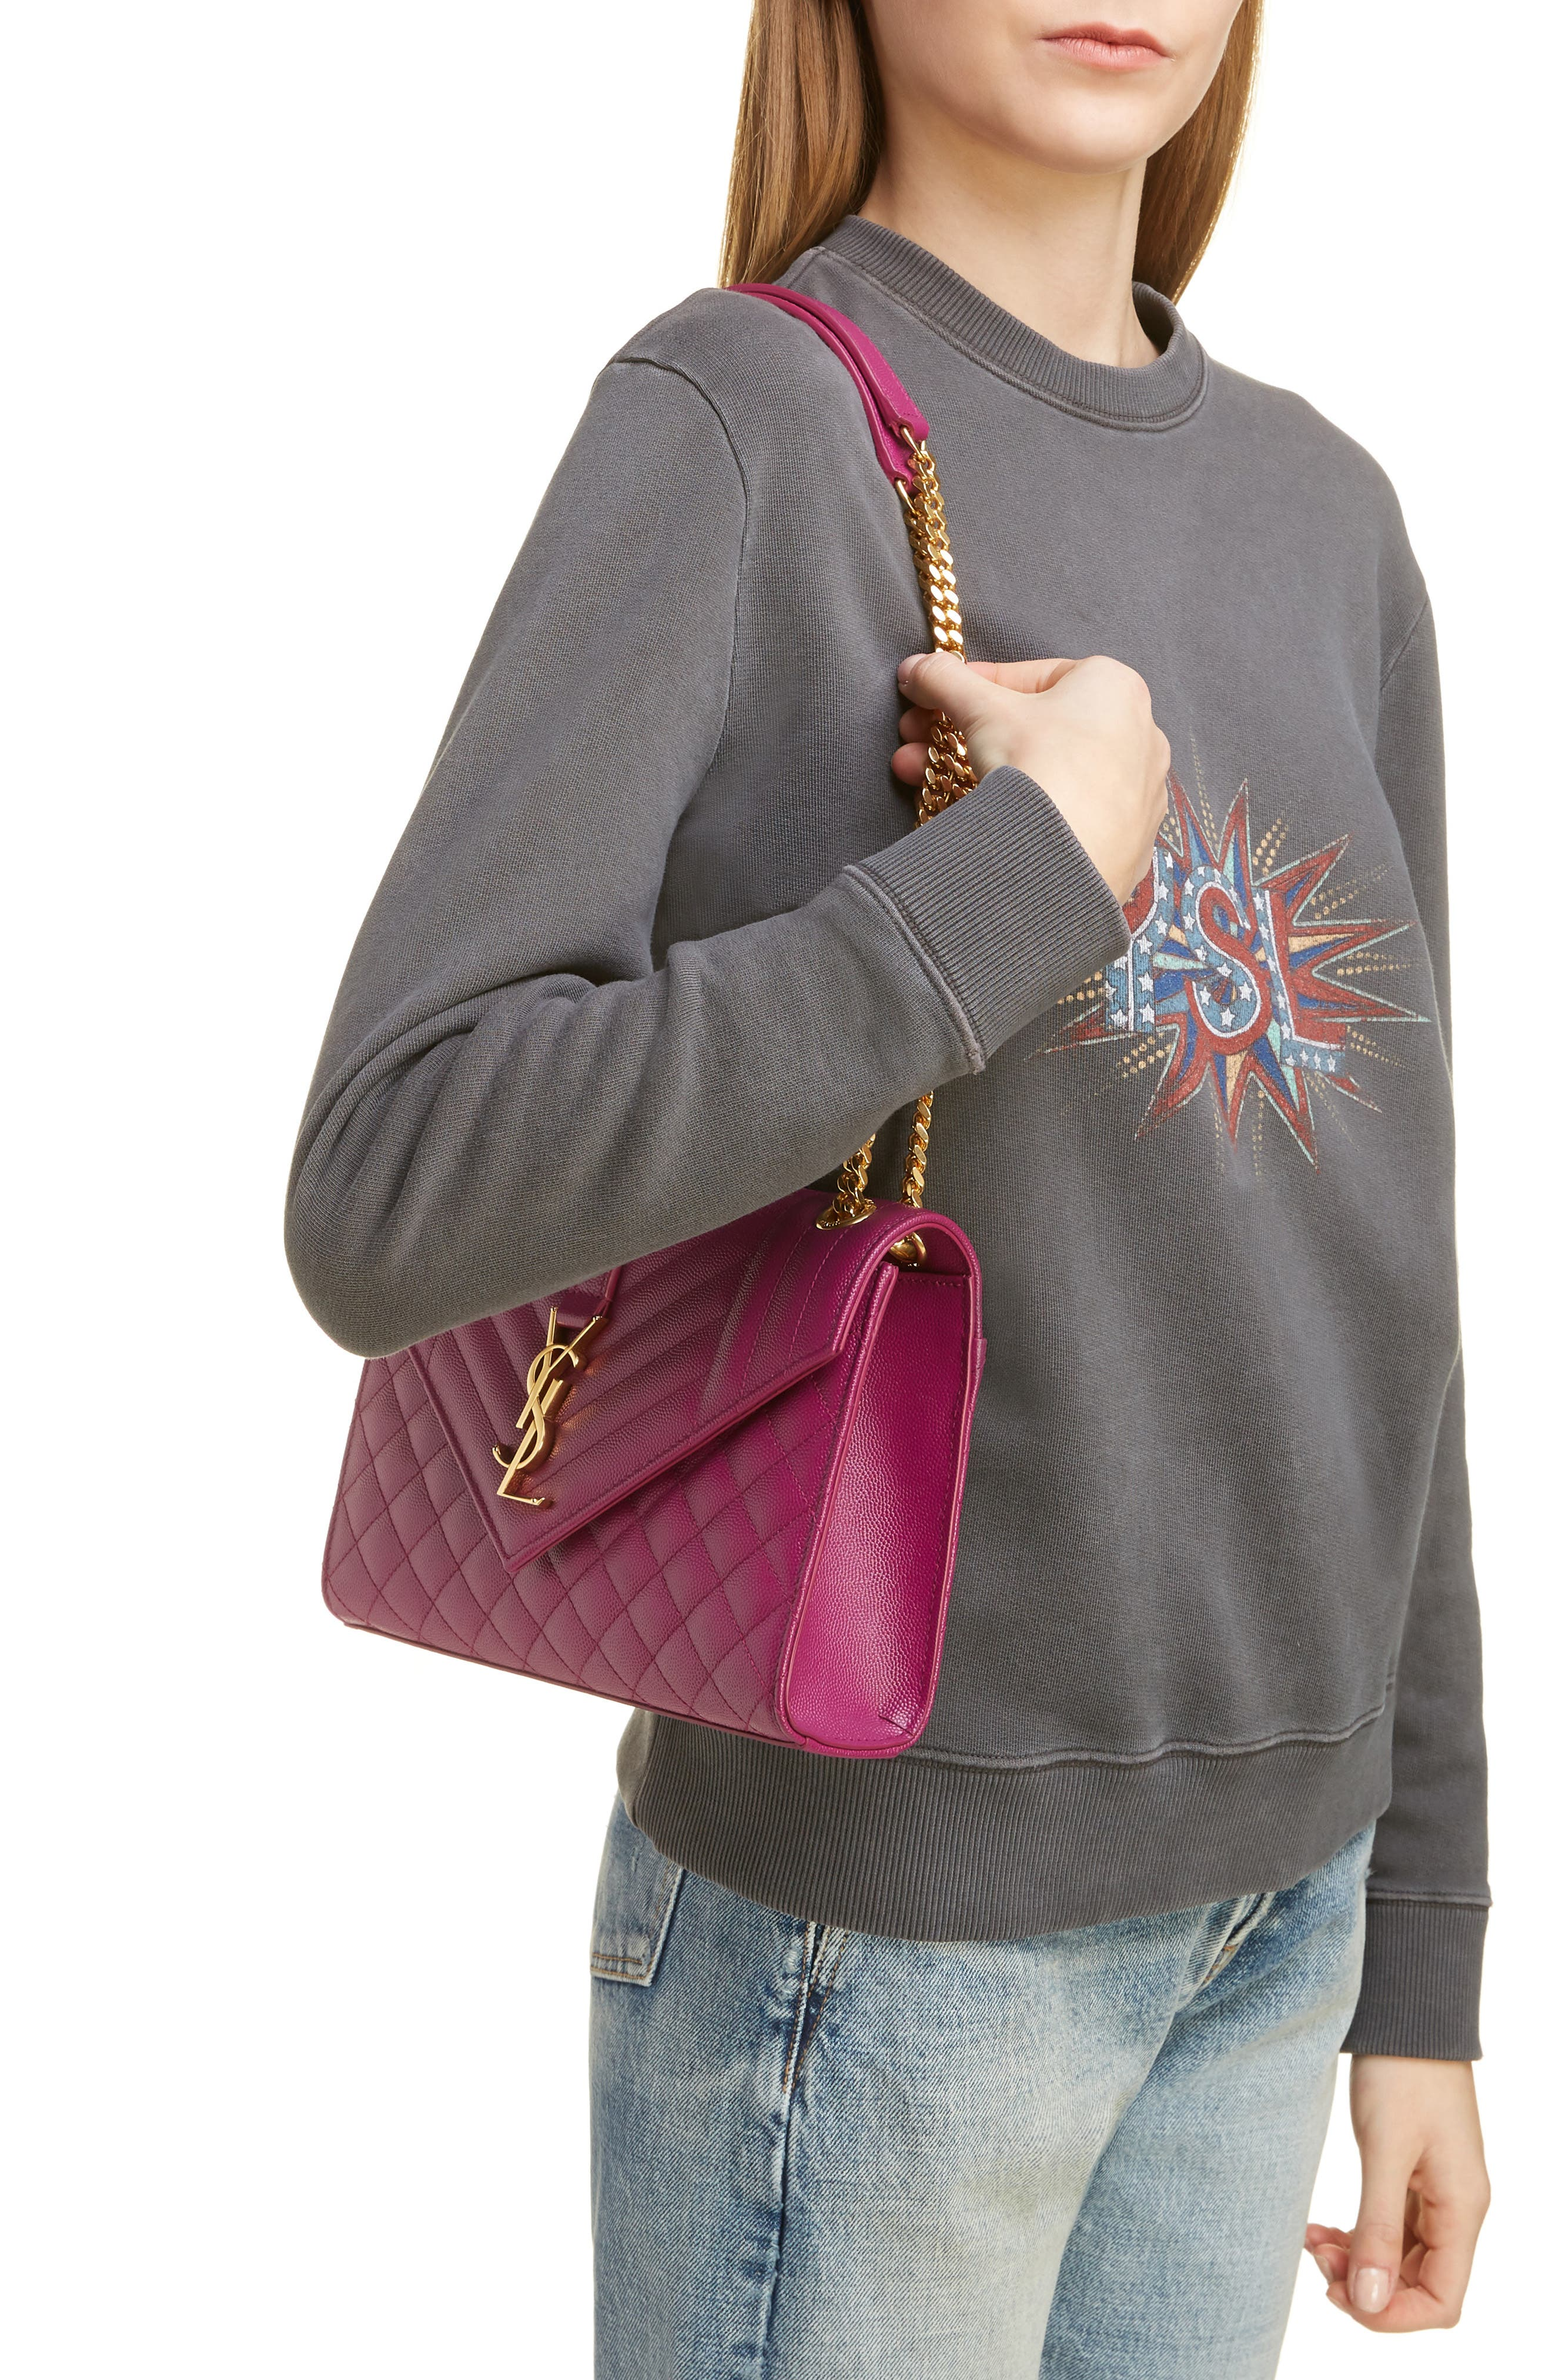 SAINT LAURENT, Medium Cassandre Calfskin Shoulder Bag, Alternate thumbnail 2, color, DARK GRAPE